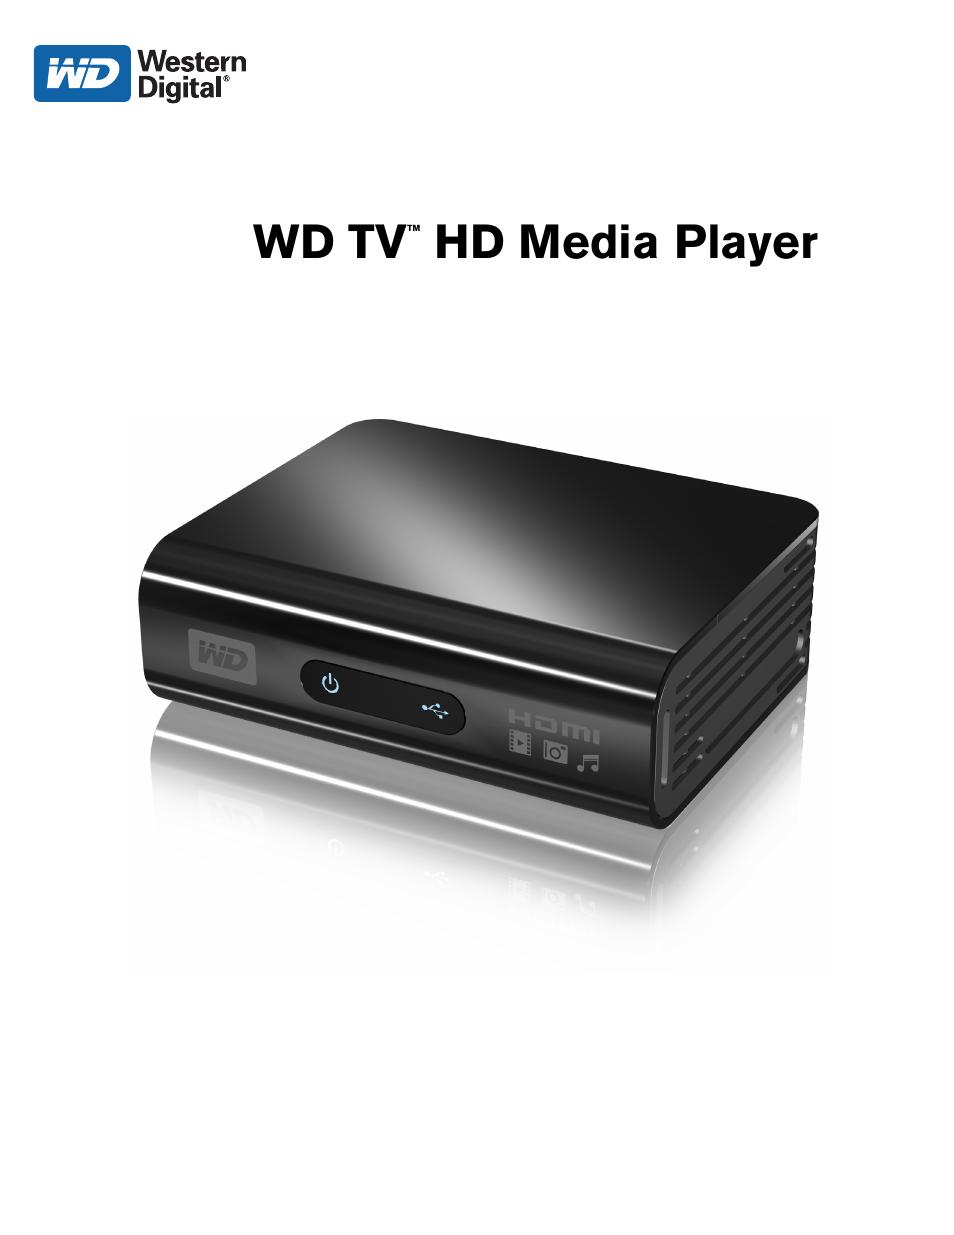 western digital wd tv hd media player gen 1 user manual user rh manualsdir com Western Digital Wireless Media Player Western Digital Media Player Problems